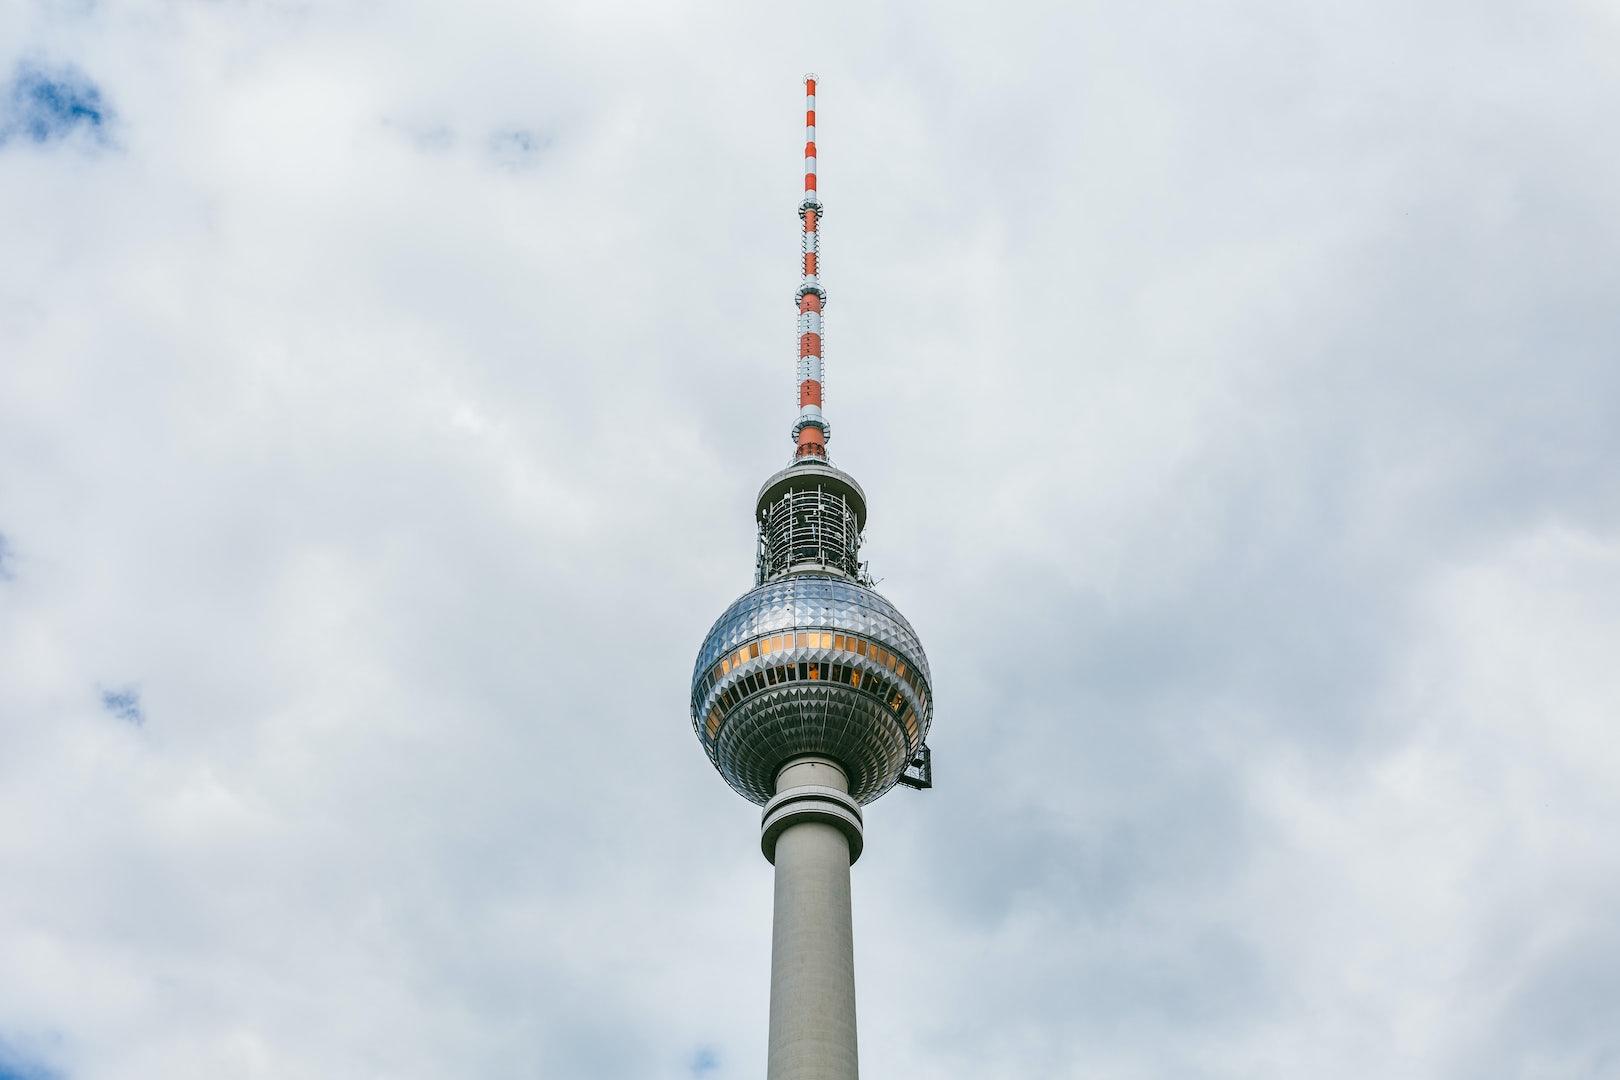 berlin fernsehturm against a blue cloudy sky